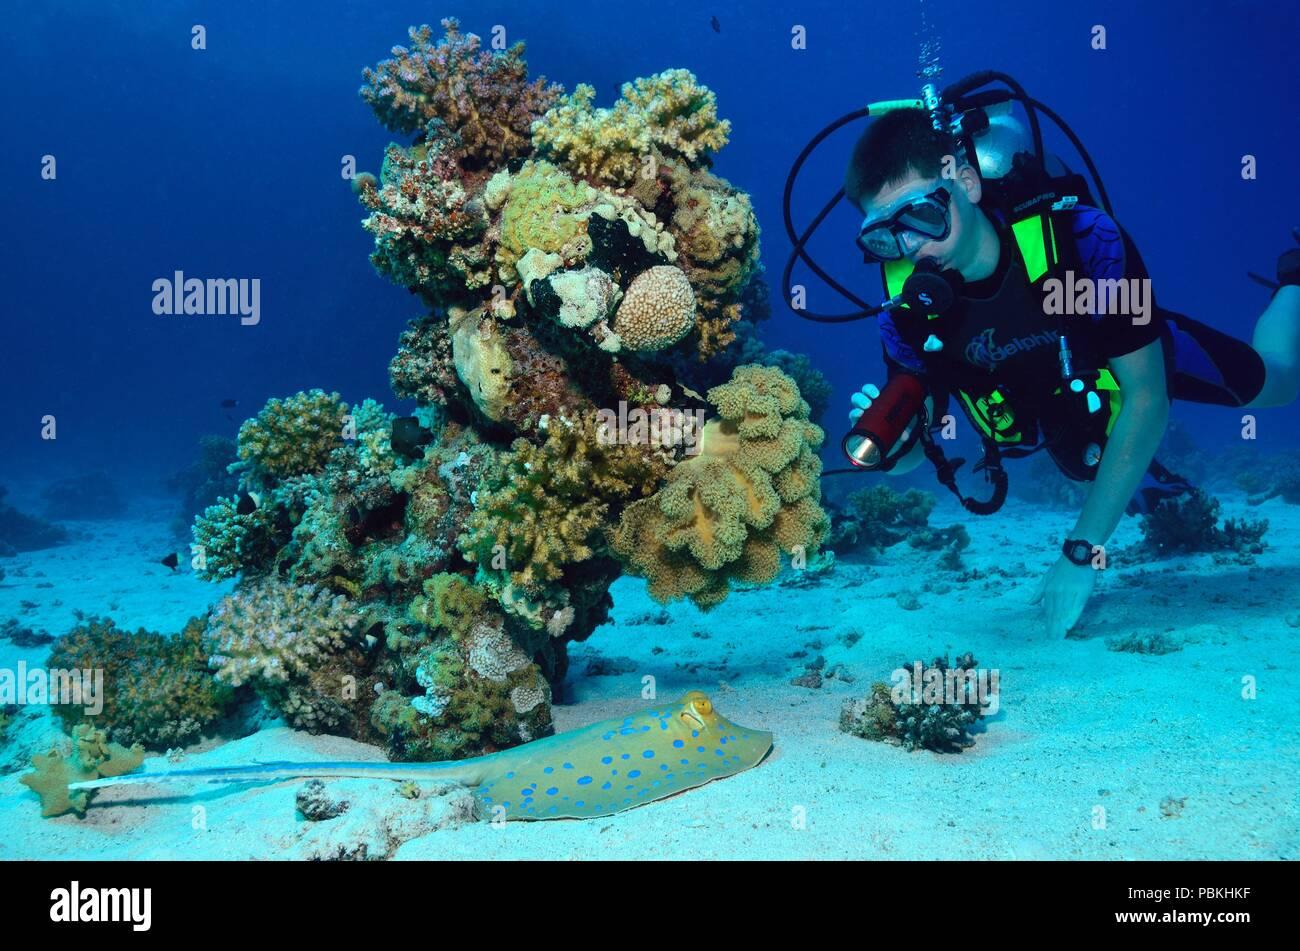 Blaupunkt Stock Photos & Blaupunkt Stock Images - Alamy